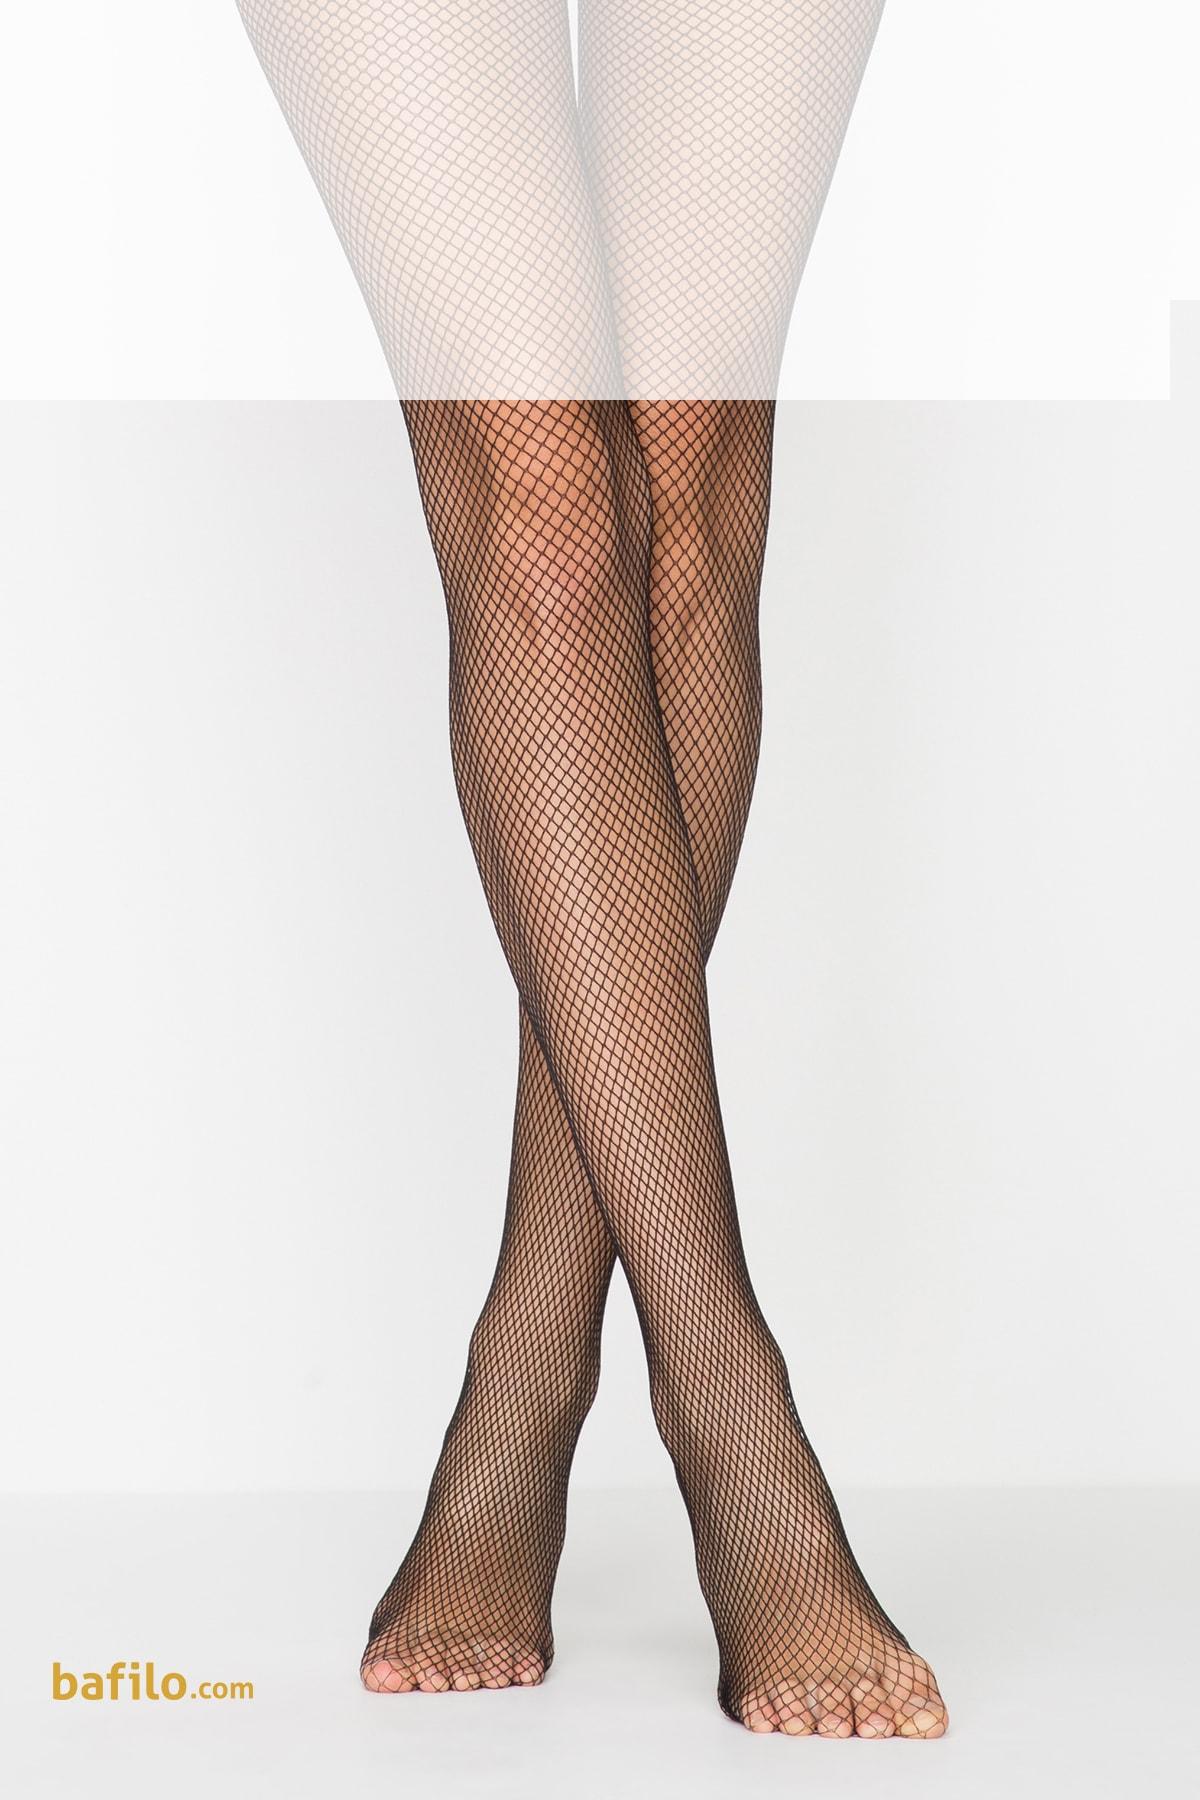 پنتی | Penti - جوراب شلواری لانه زنبوری ریز زنانه رنگ مشکی